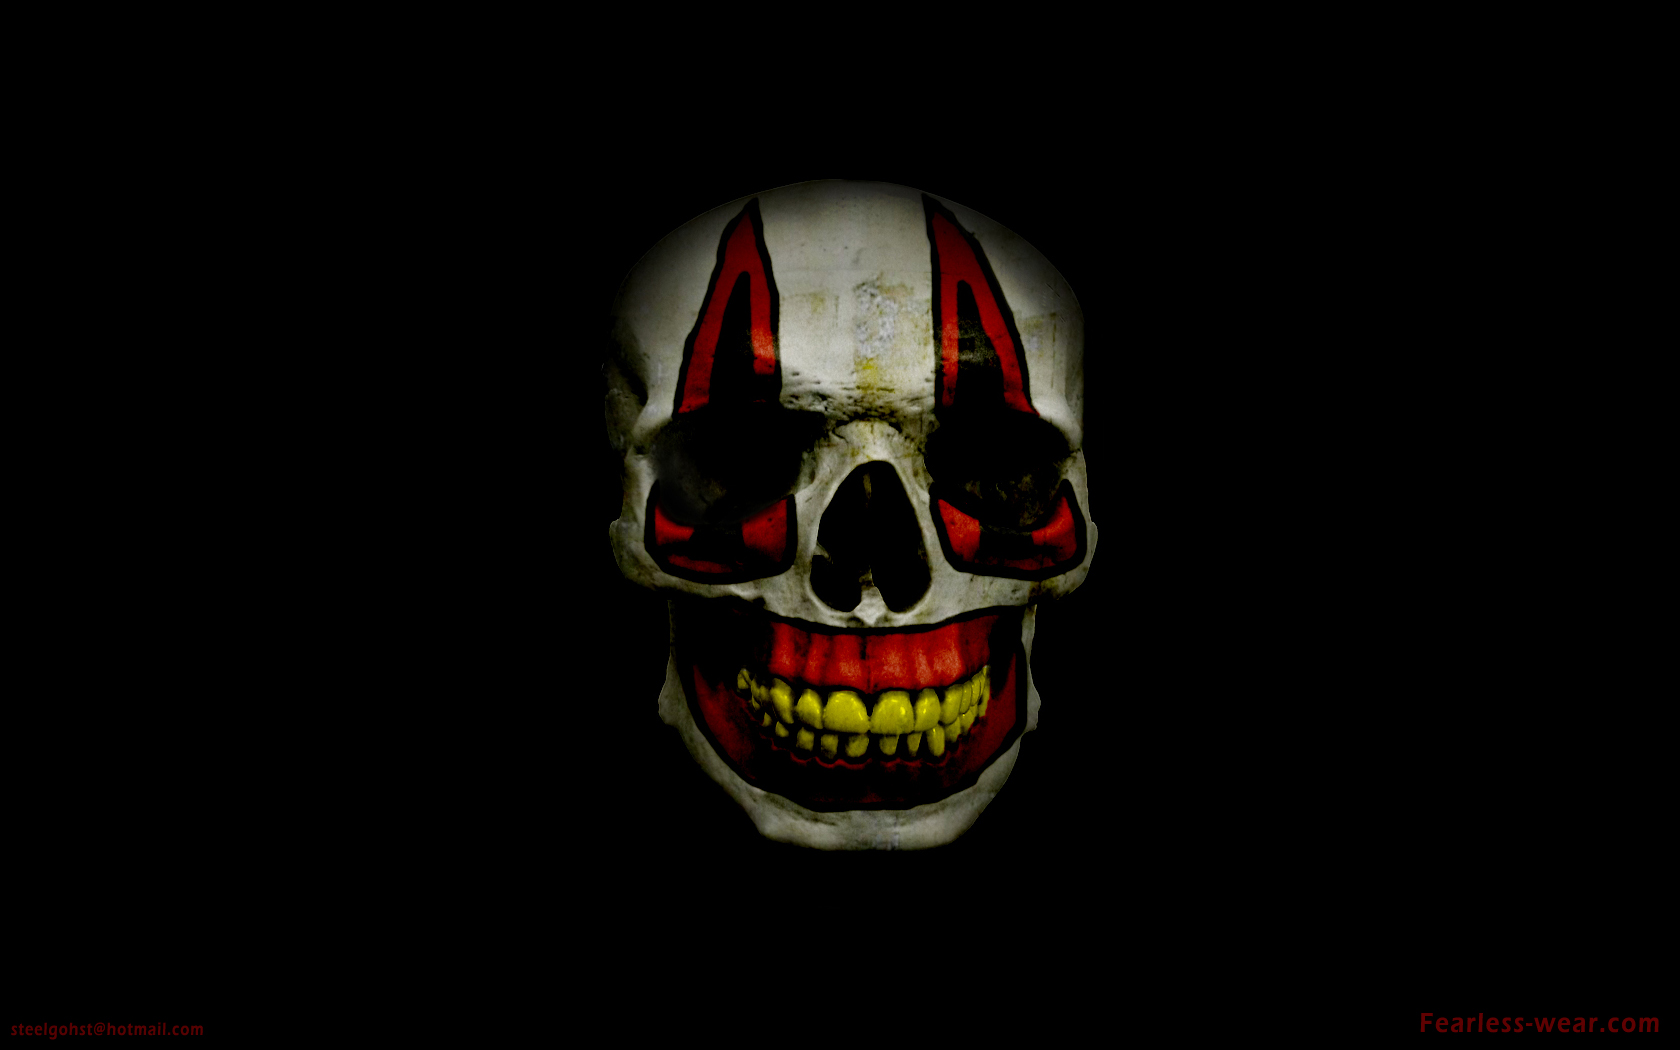 clown skull by steelgohst on DeviantArt